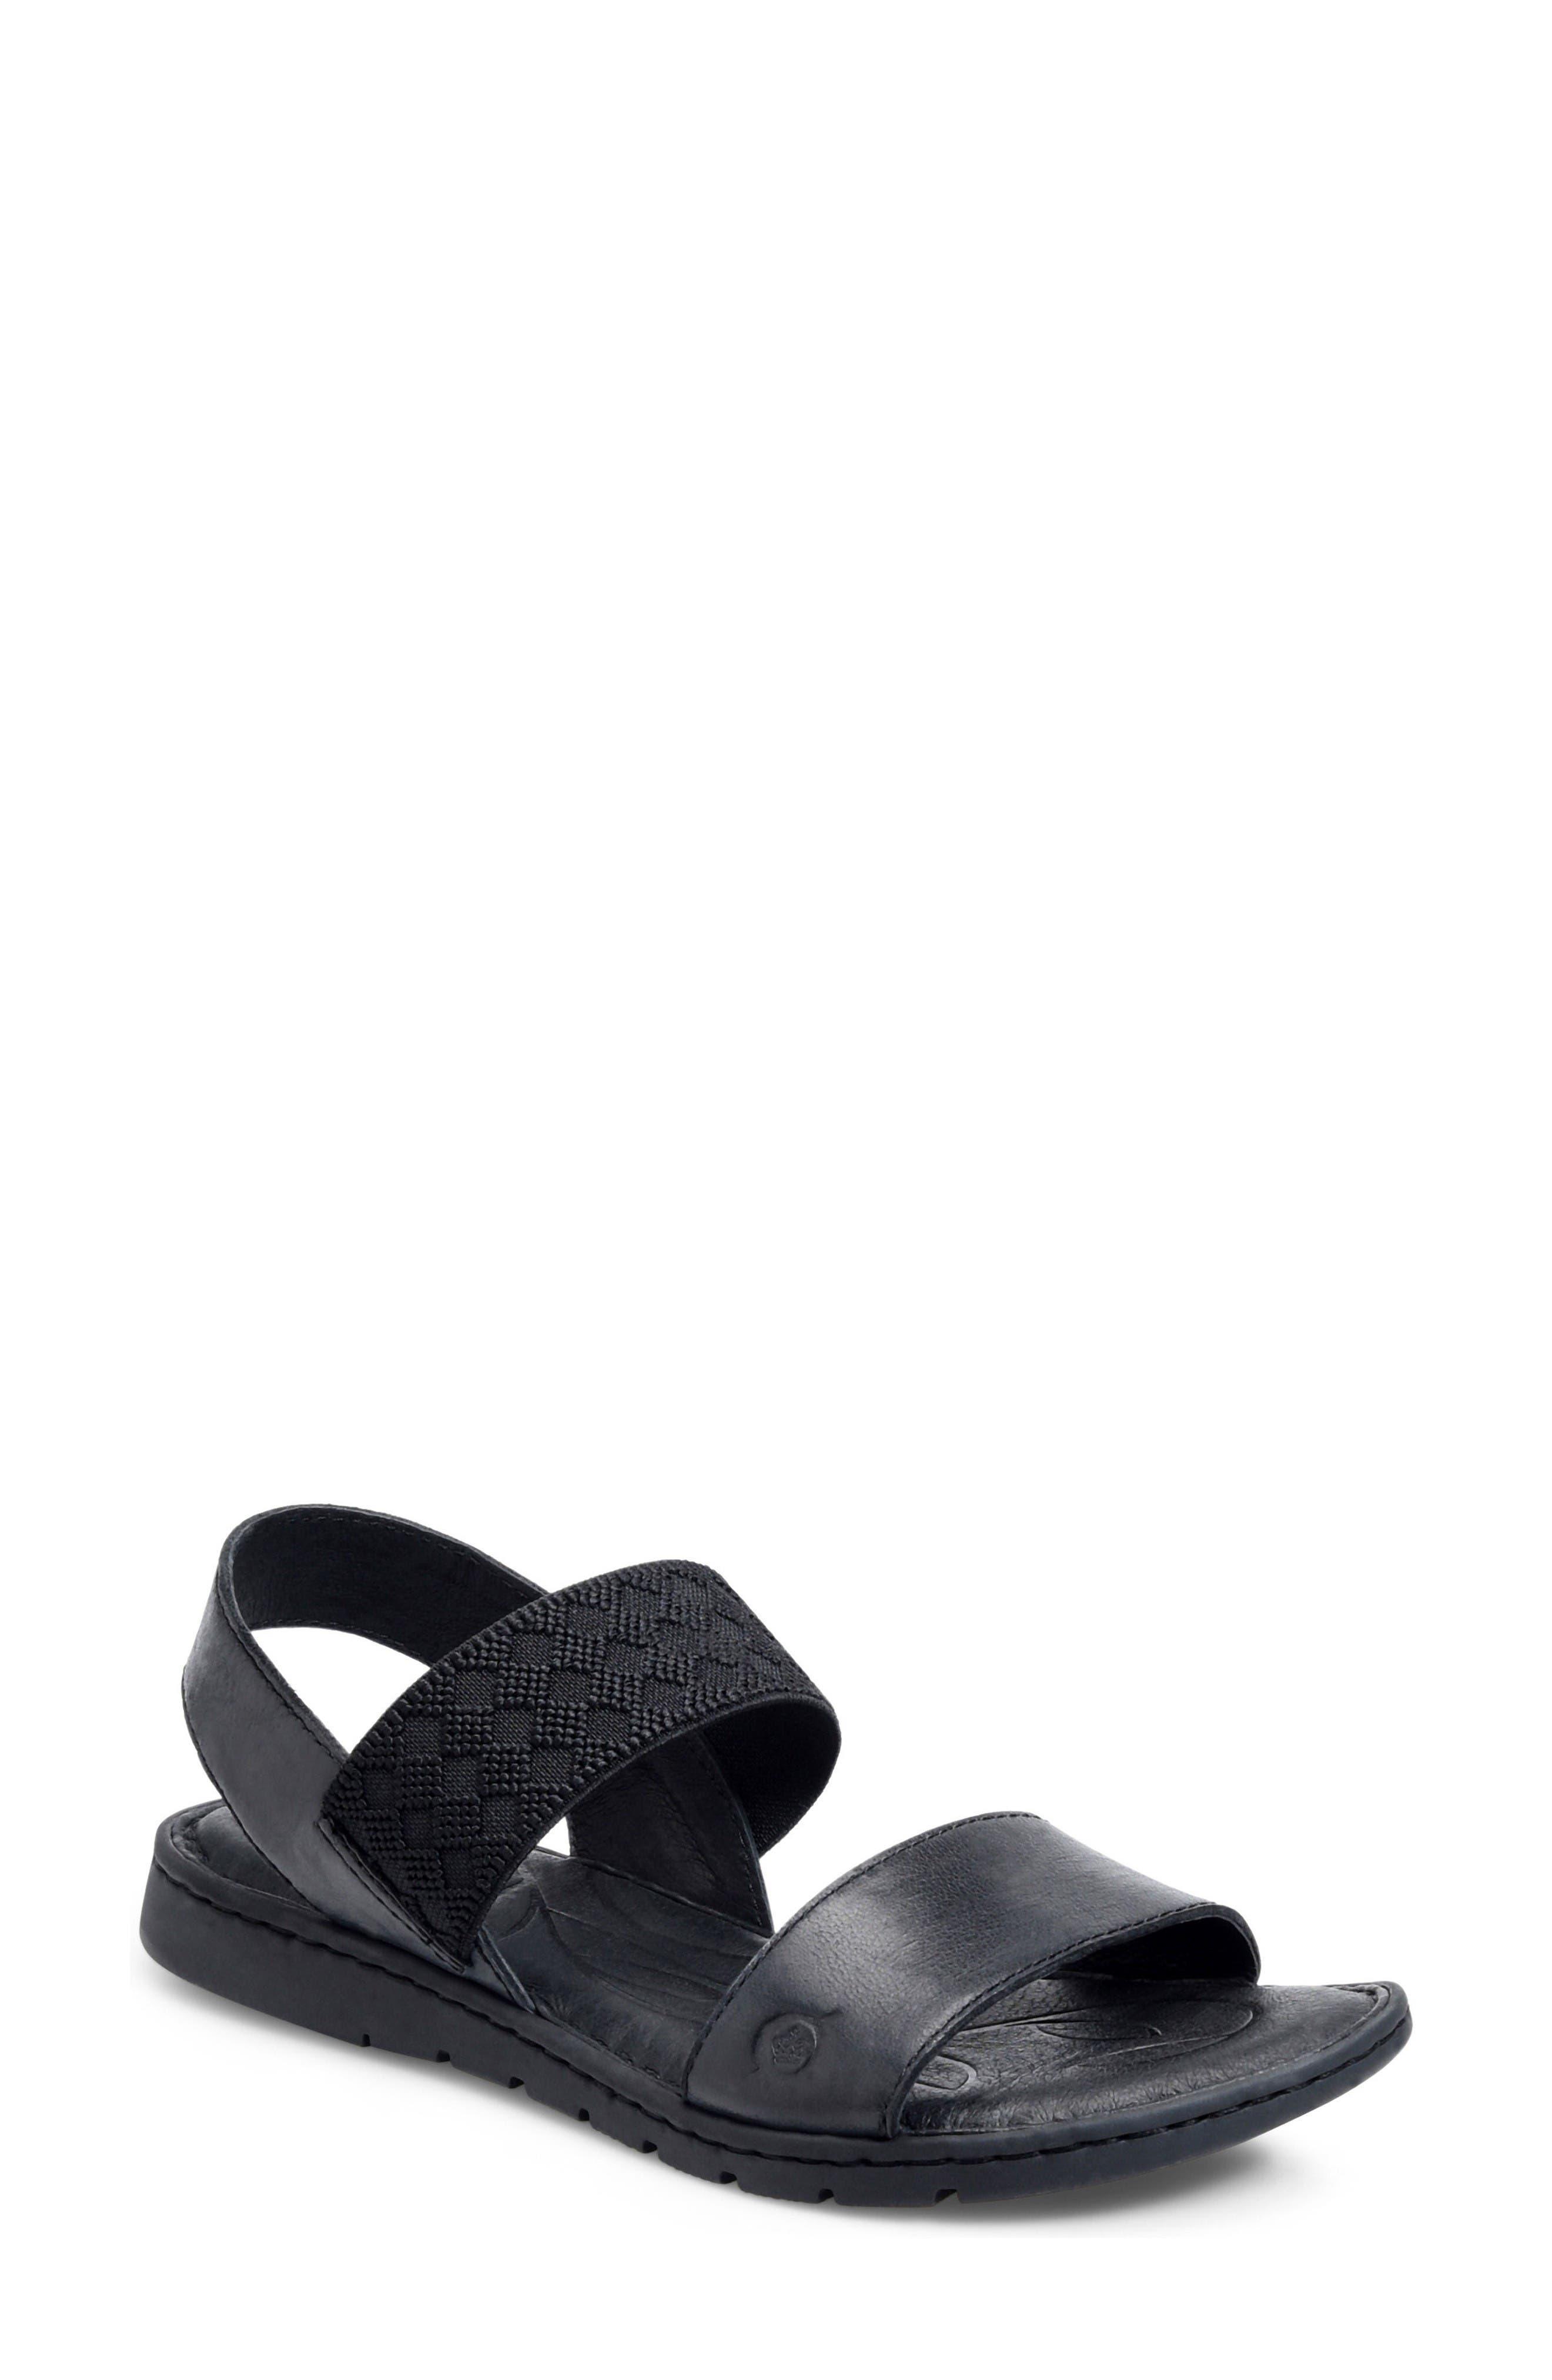 Børn Parsons Sandal (Women)